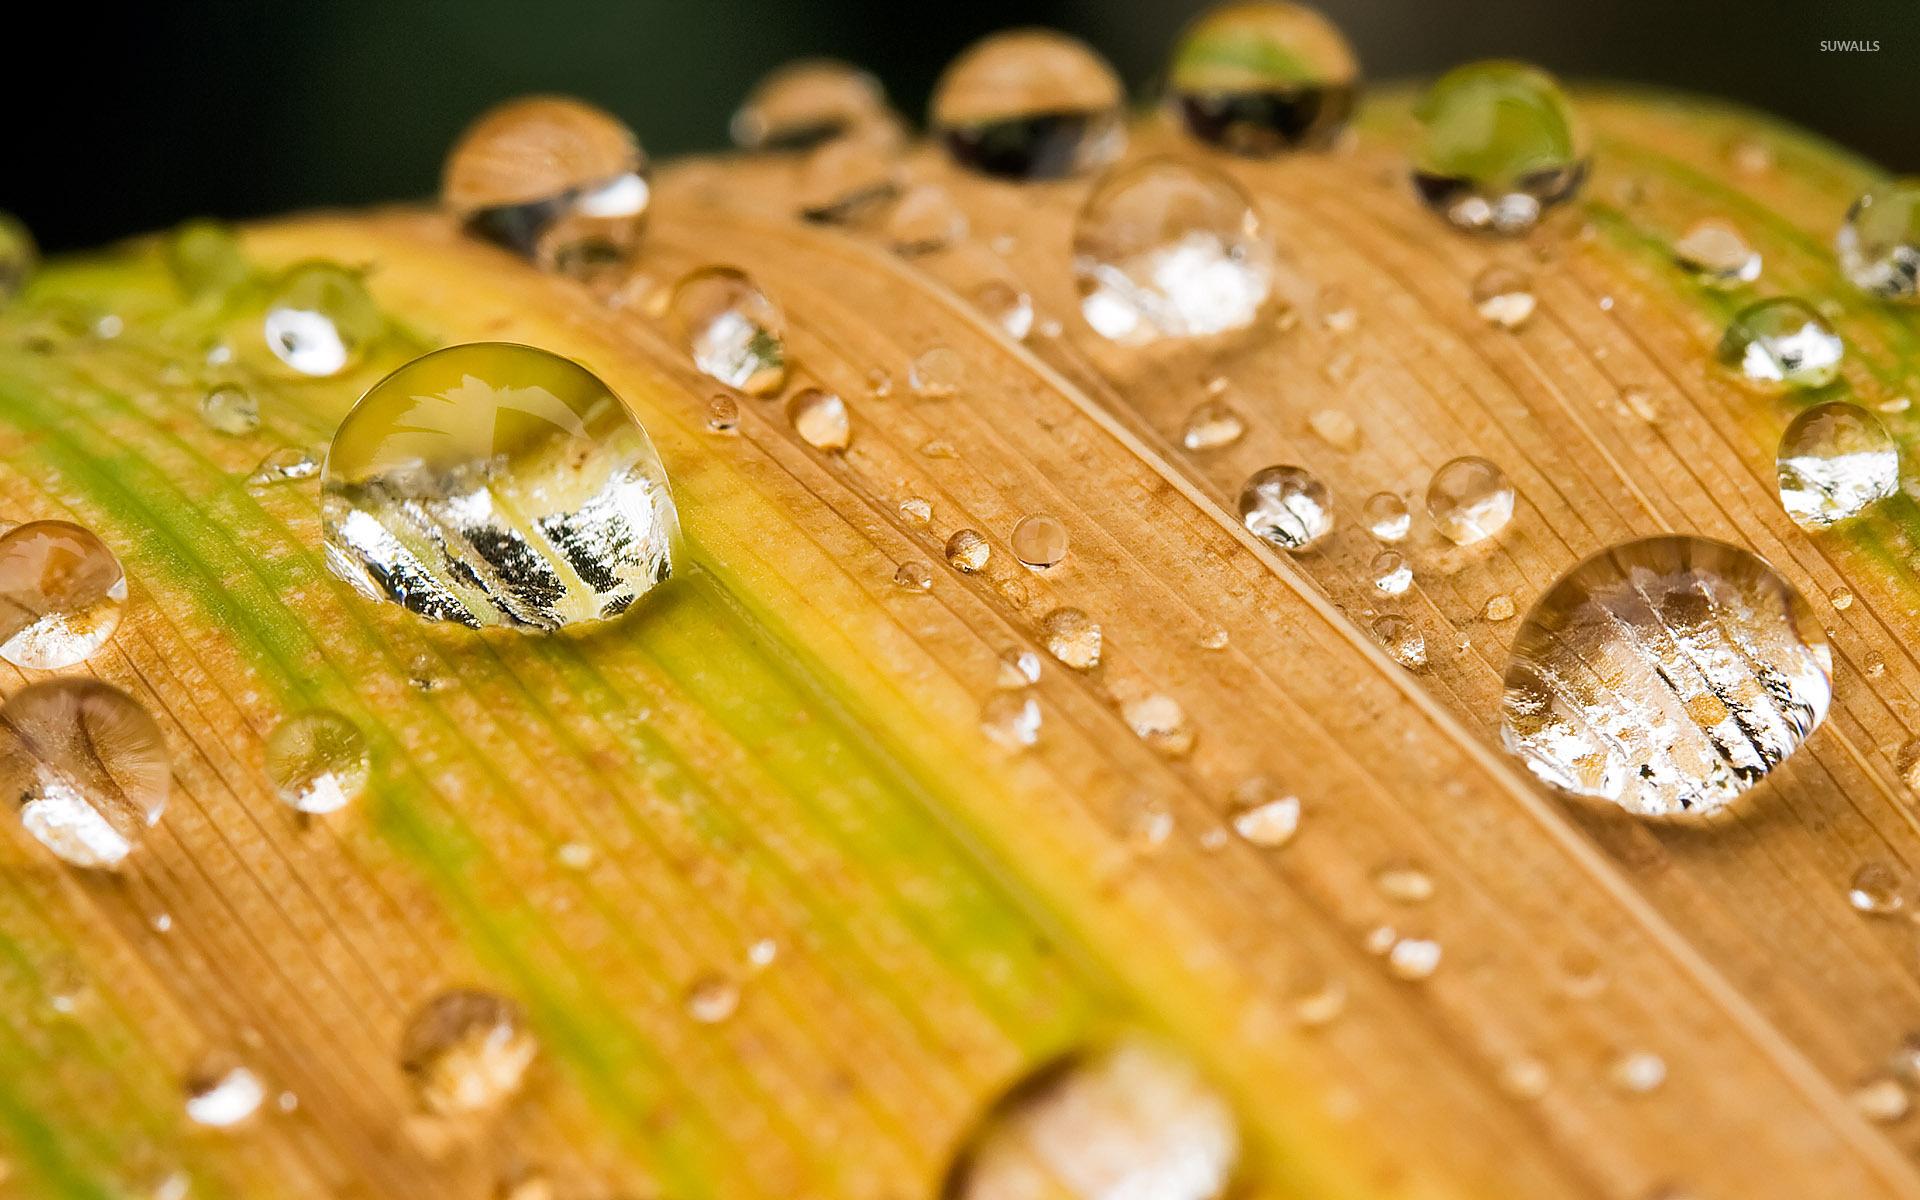 Water Drops On A Leaf Wallpaper